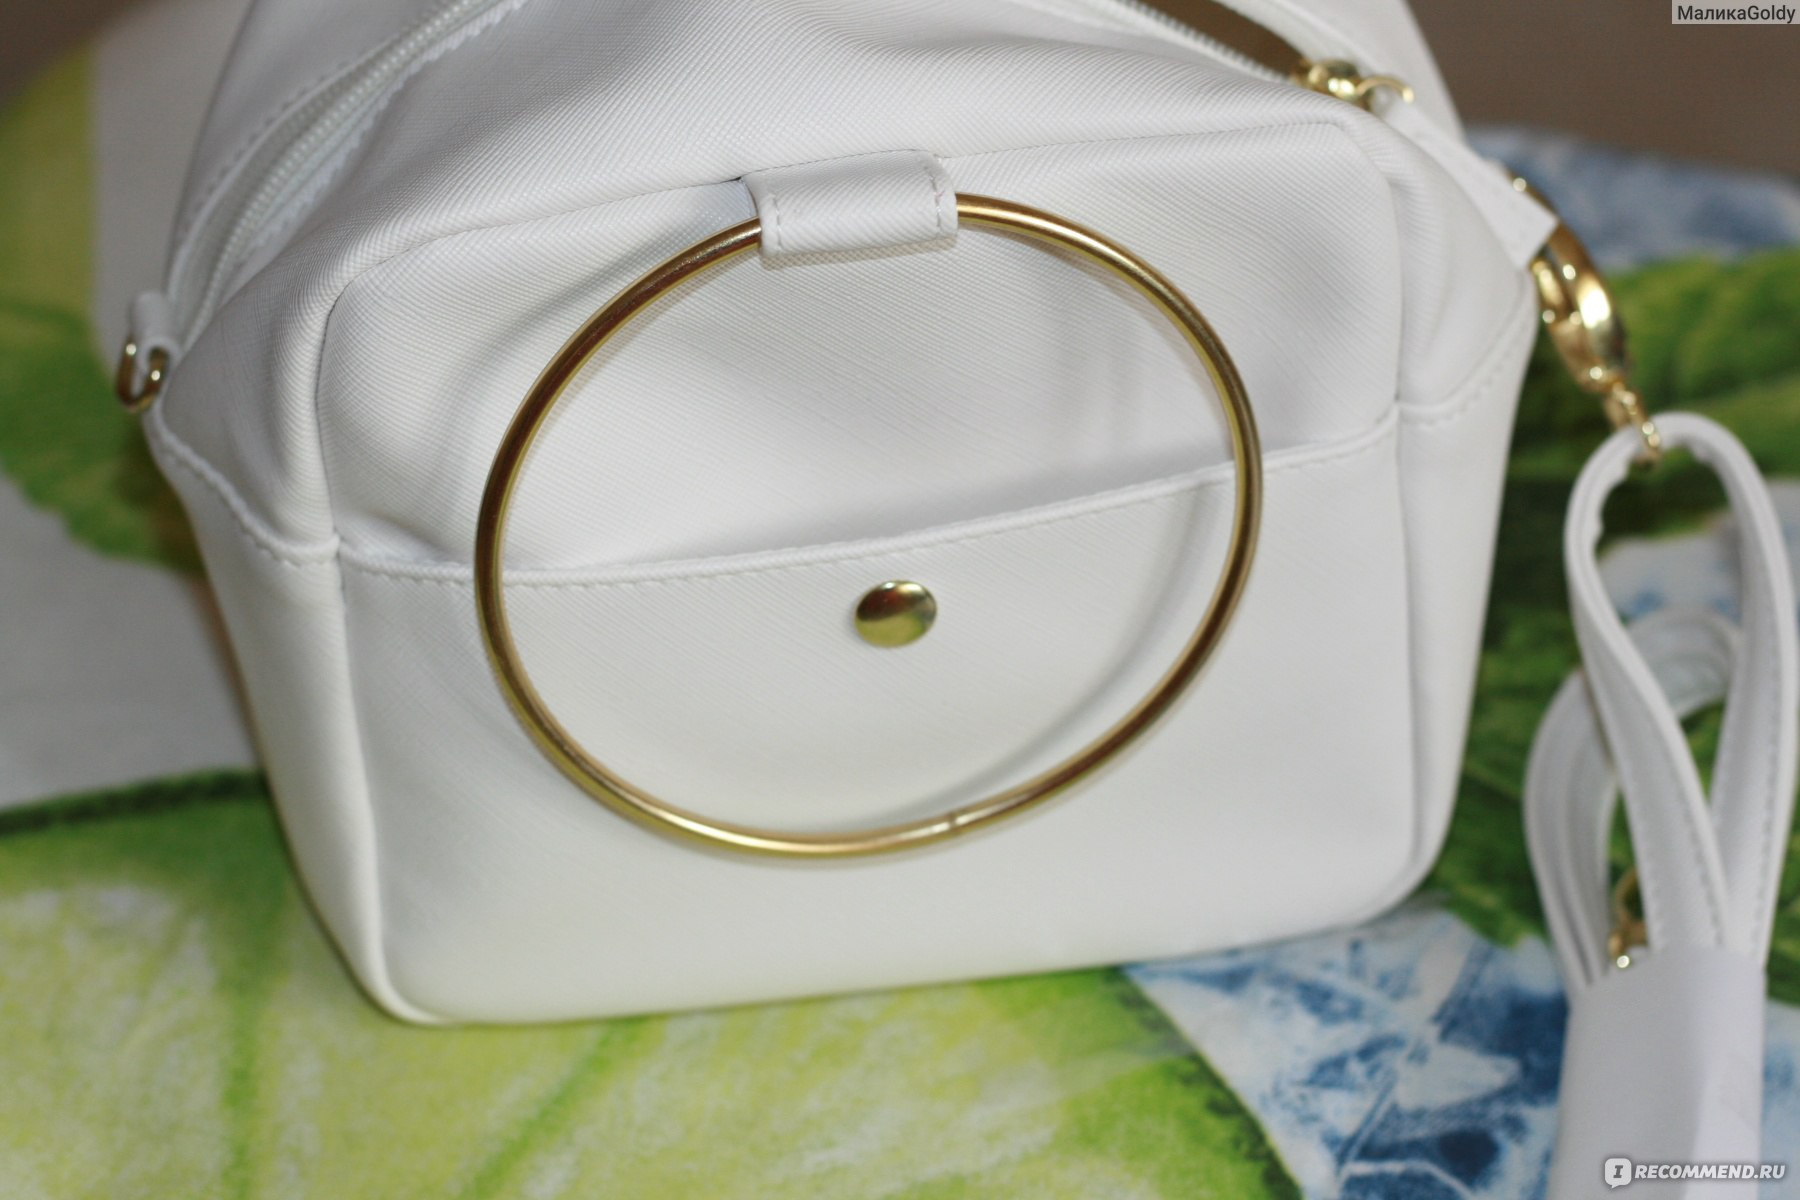 42beb3d2dff4 Сумка Женская Avon Милена - «маленькая белая летняя сумочка под ...